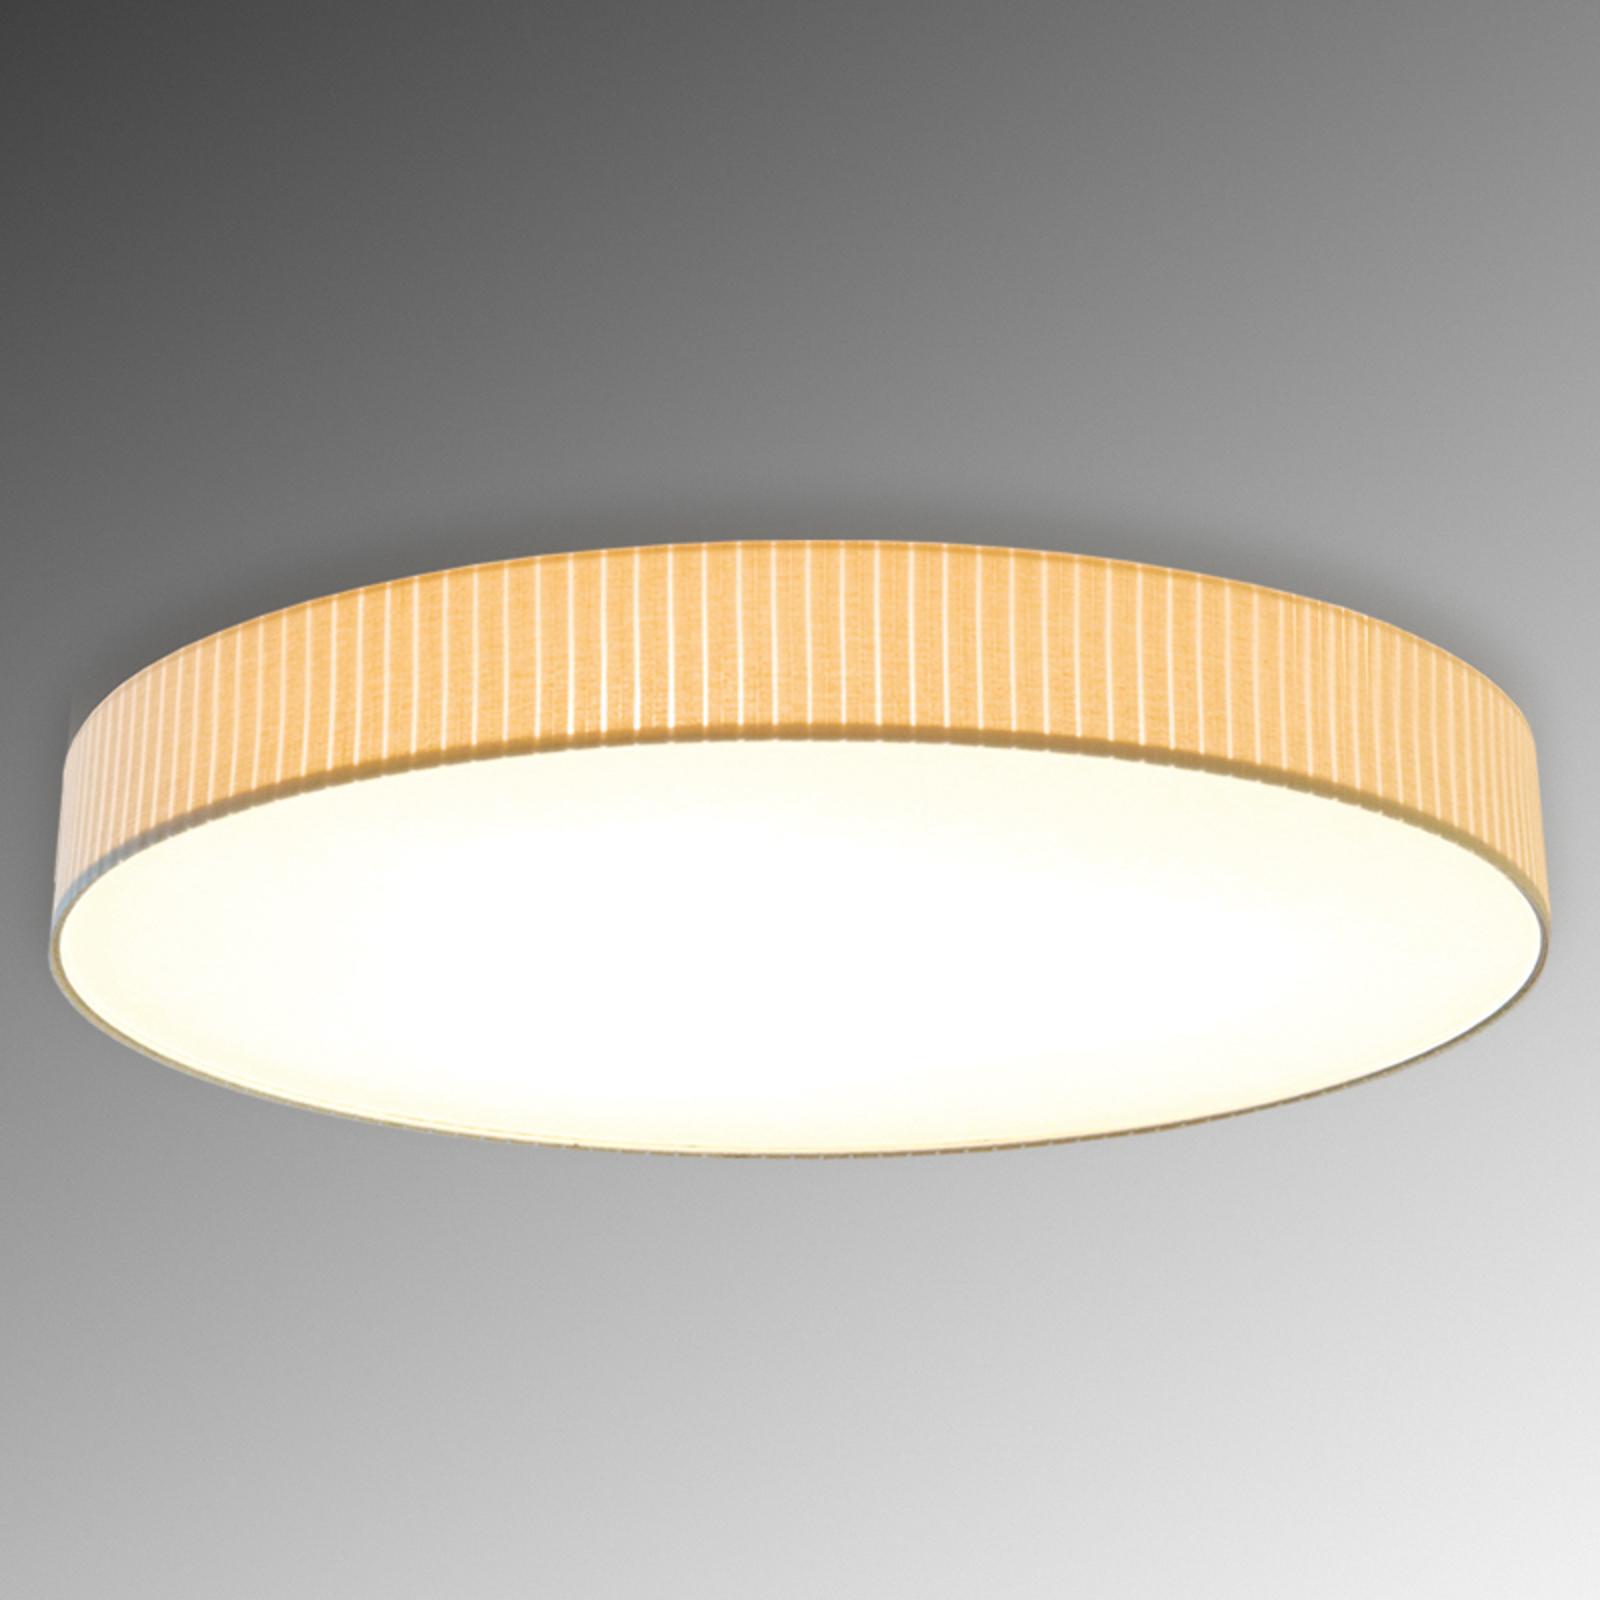 Mooie plafondlamp Onda, diameter 90 cm